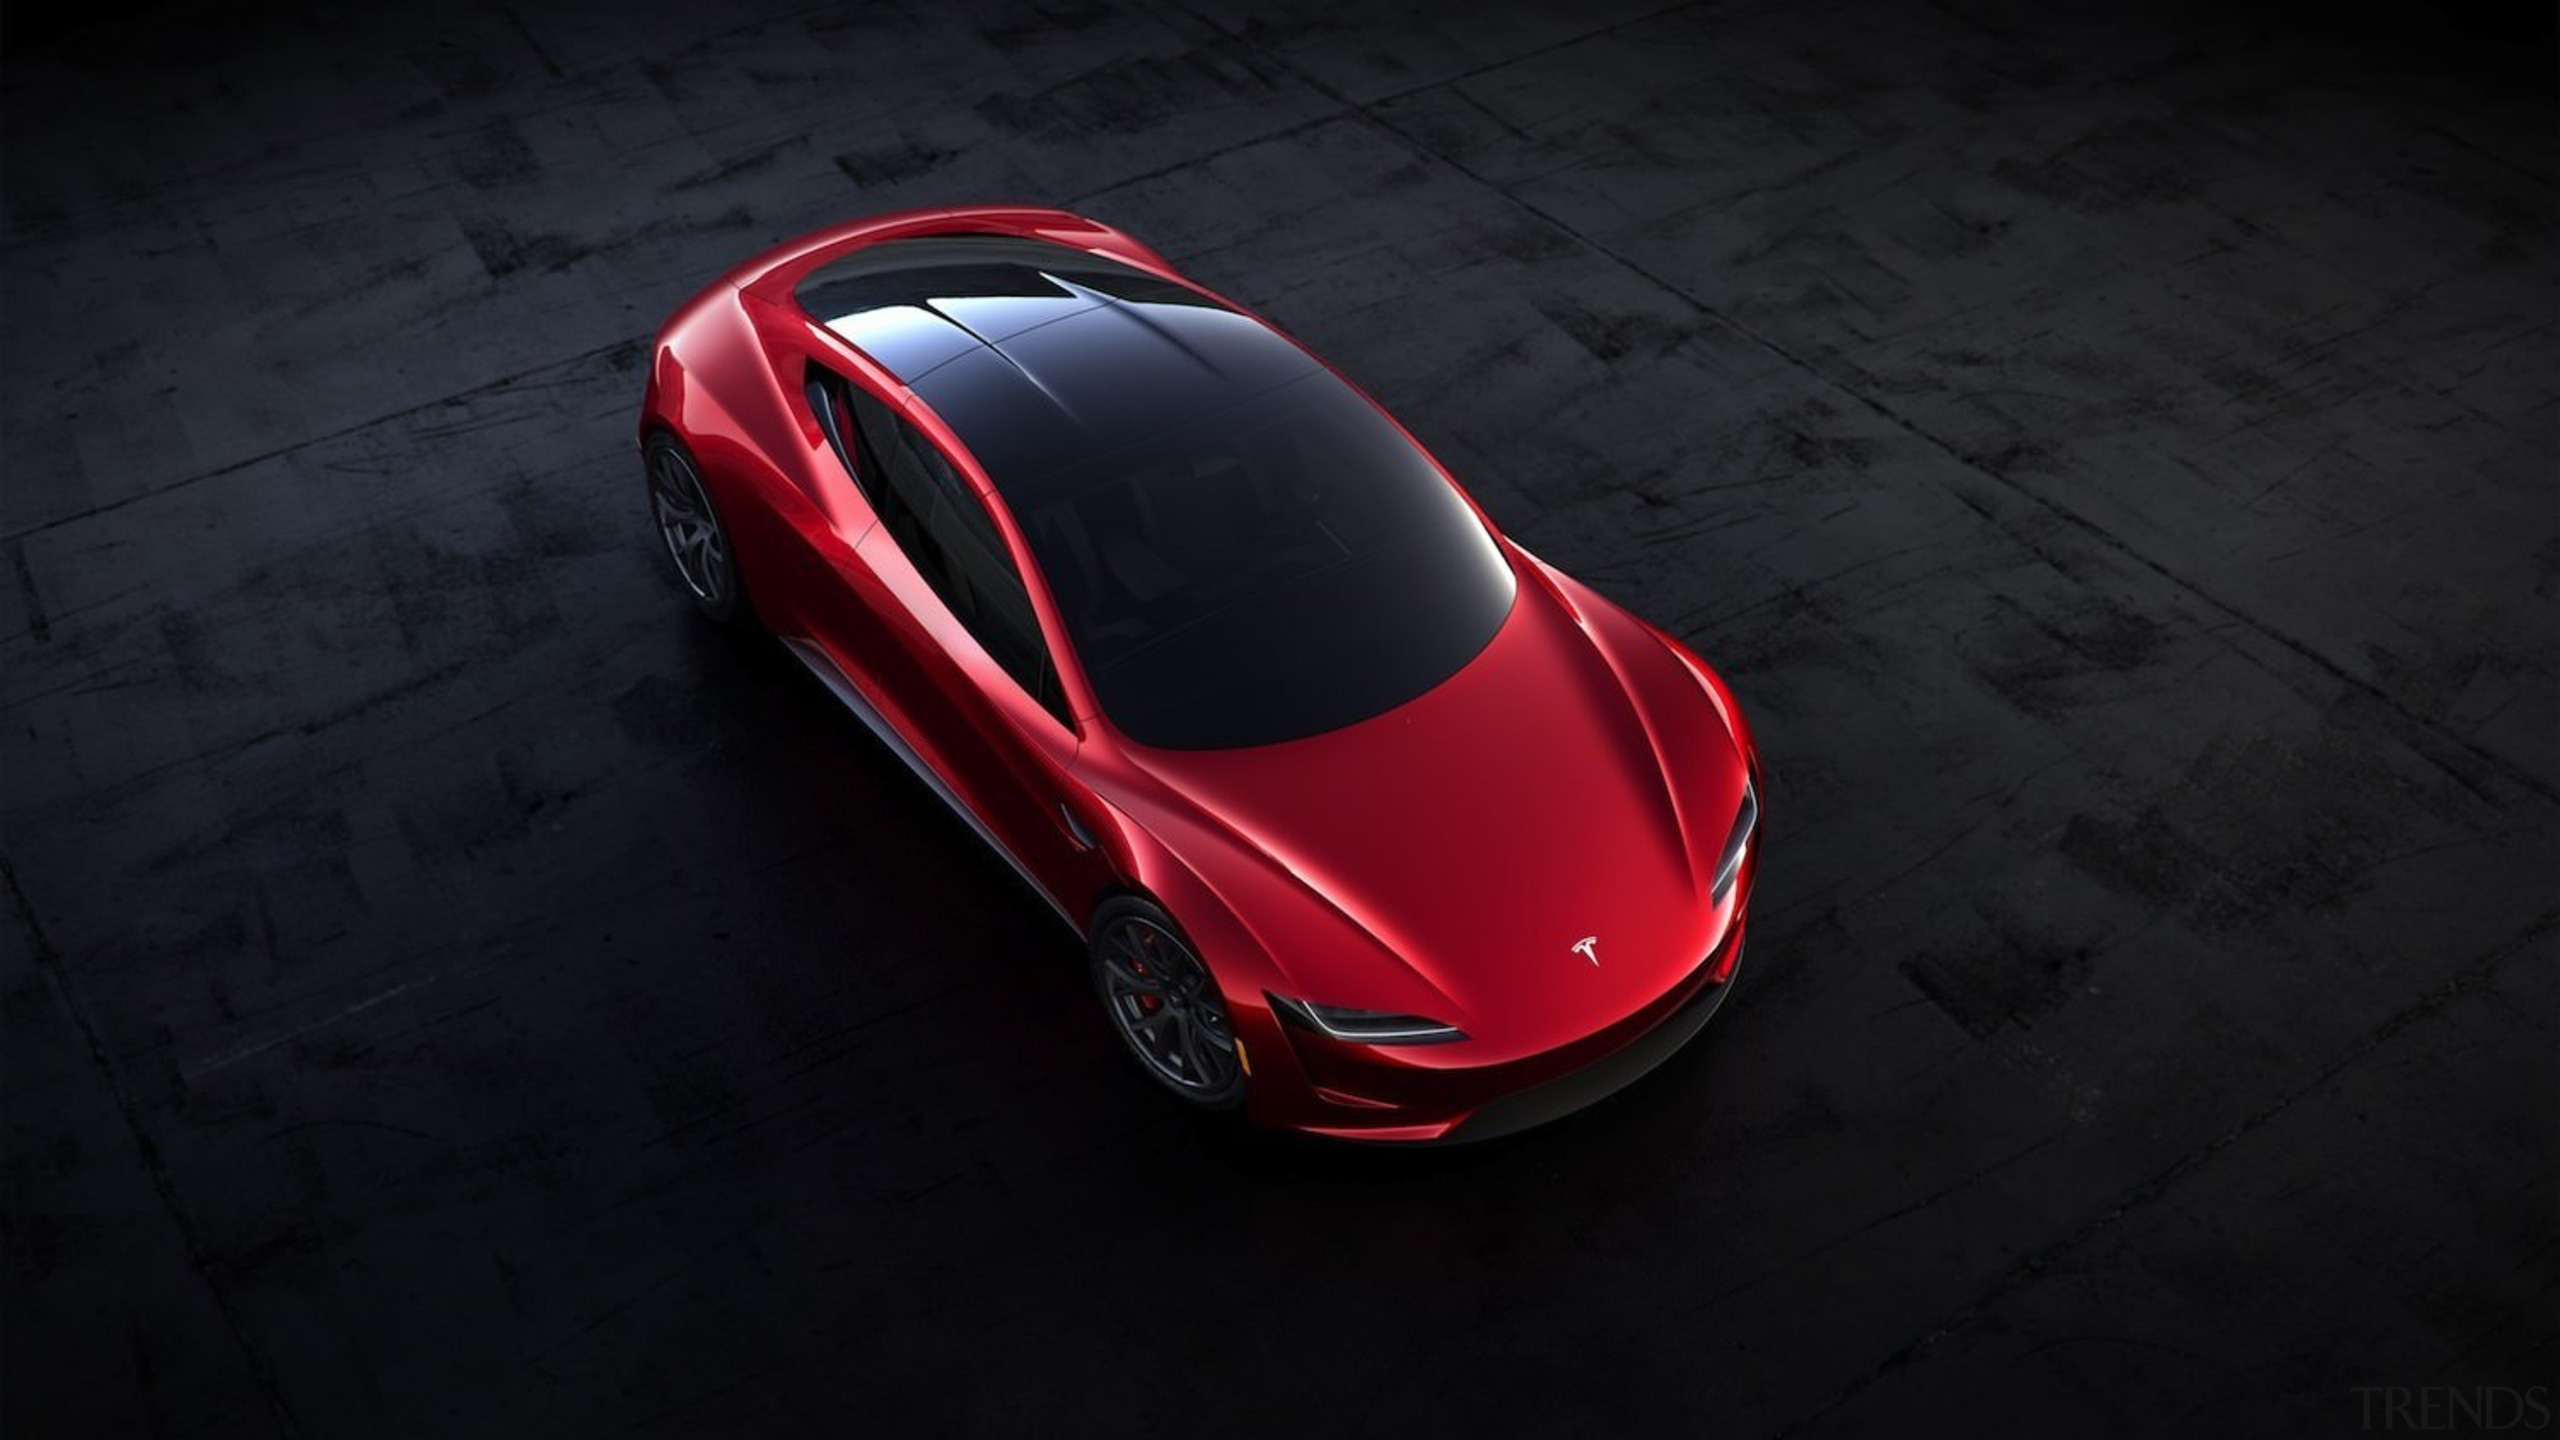 Tesla's new Roadster - Tesla's new Roadster - automotive design, automotive lighting, car, computer wallpaper, concept car, ferrari 458, land vehicle, luxury vehicle, mode of transport, motor vehicle, performance car, product design, race car, red, sports car, supercar, technology, vehicle, black